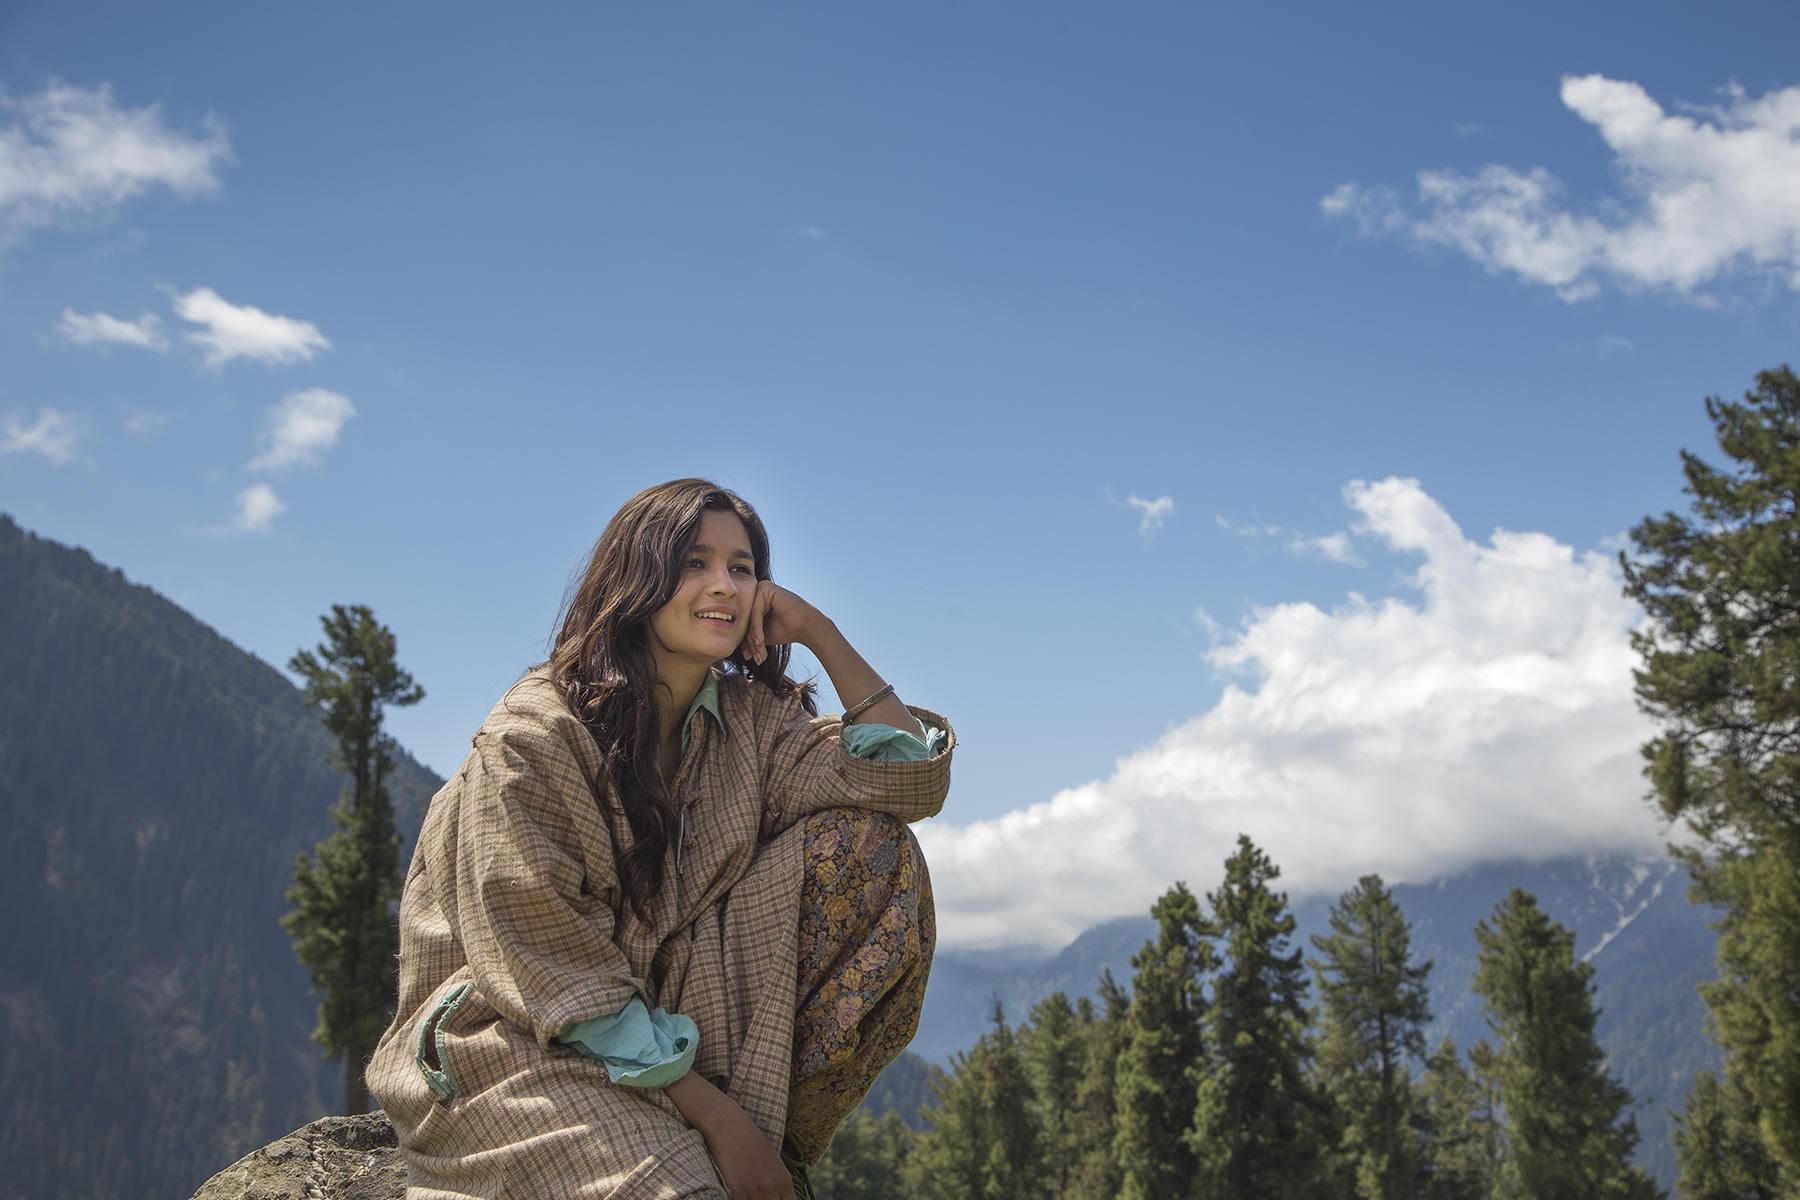 Recent Films That Were Shot In Kashmir  Filmfarecom-2596